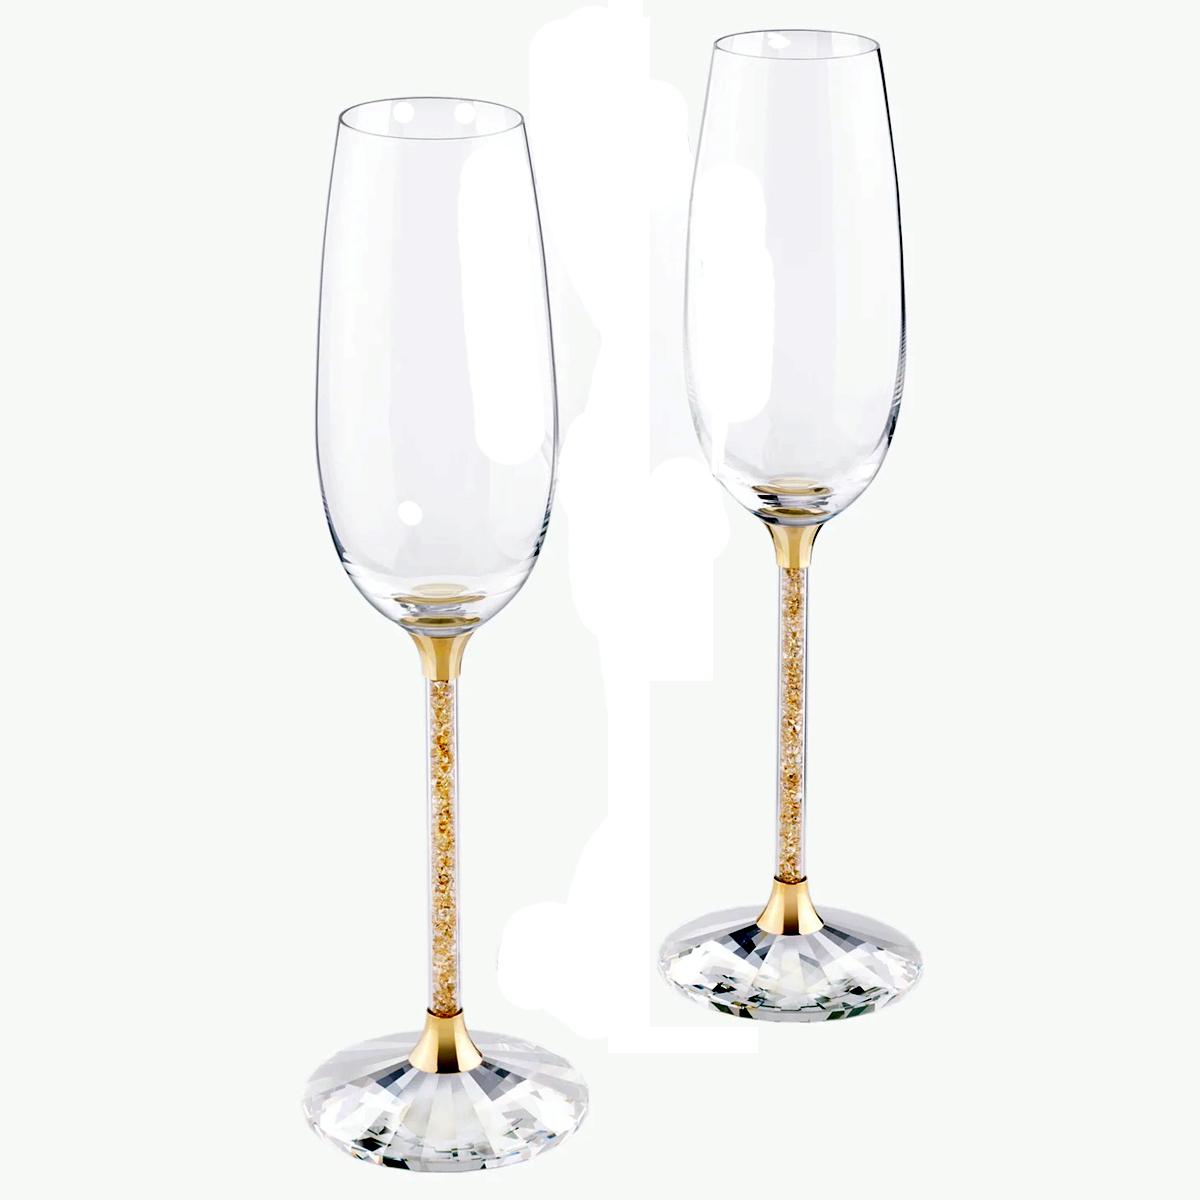 Salada Bowl Swarovski Swarovski Pair Champagne Glass Flute Glass